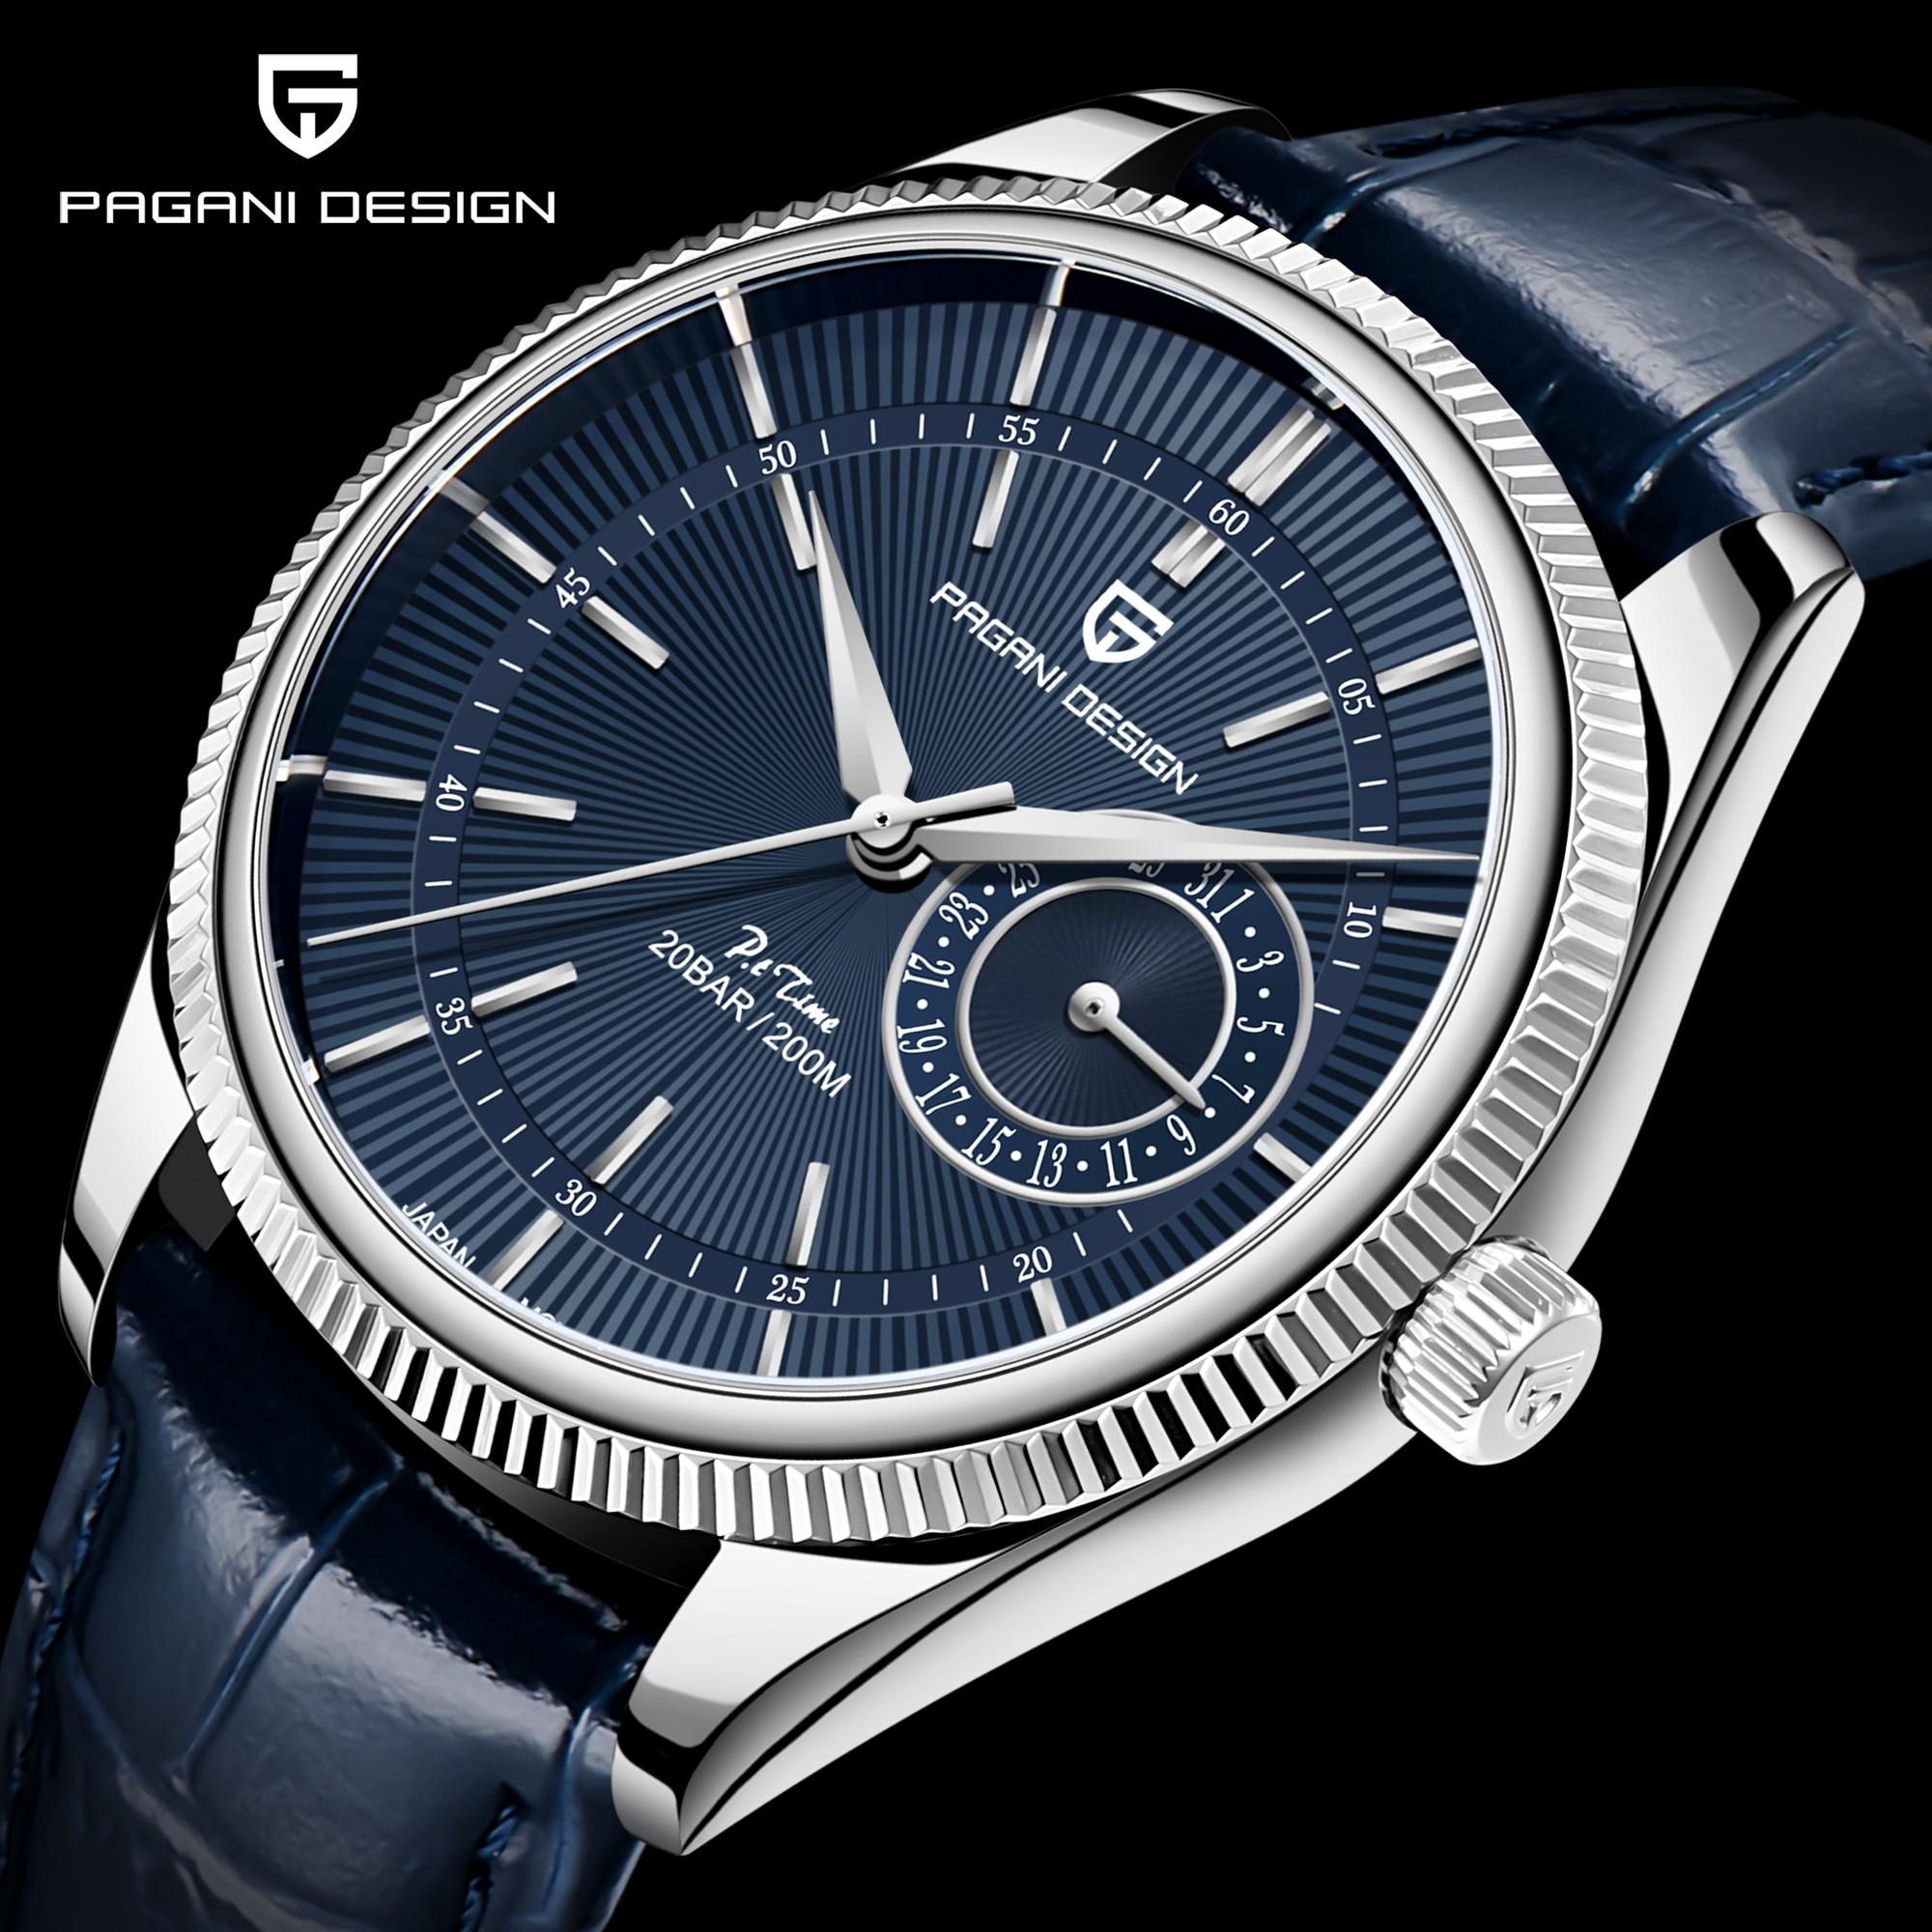 2021 New PAGANI Design Top Brand Men's Quartz Watch Sapphire VH65 Automatic Watch 200m Waterproof Me